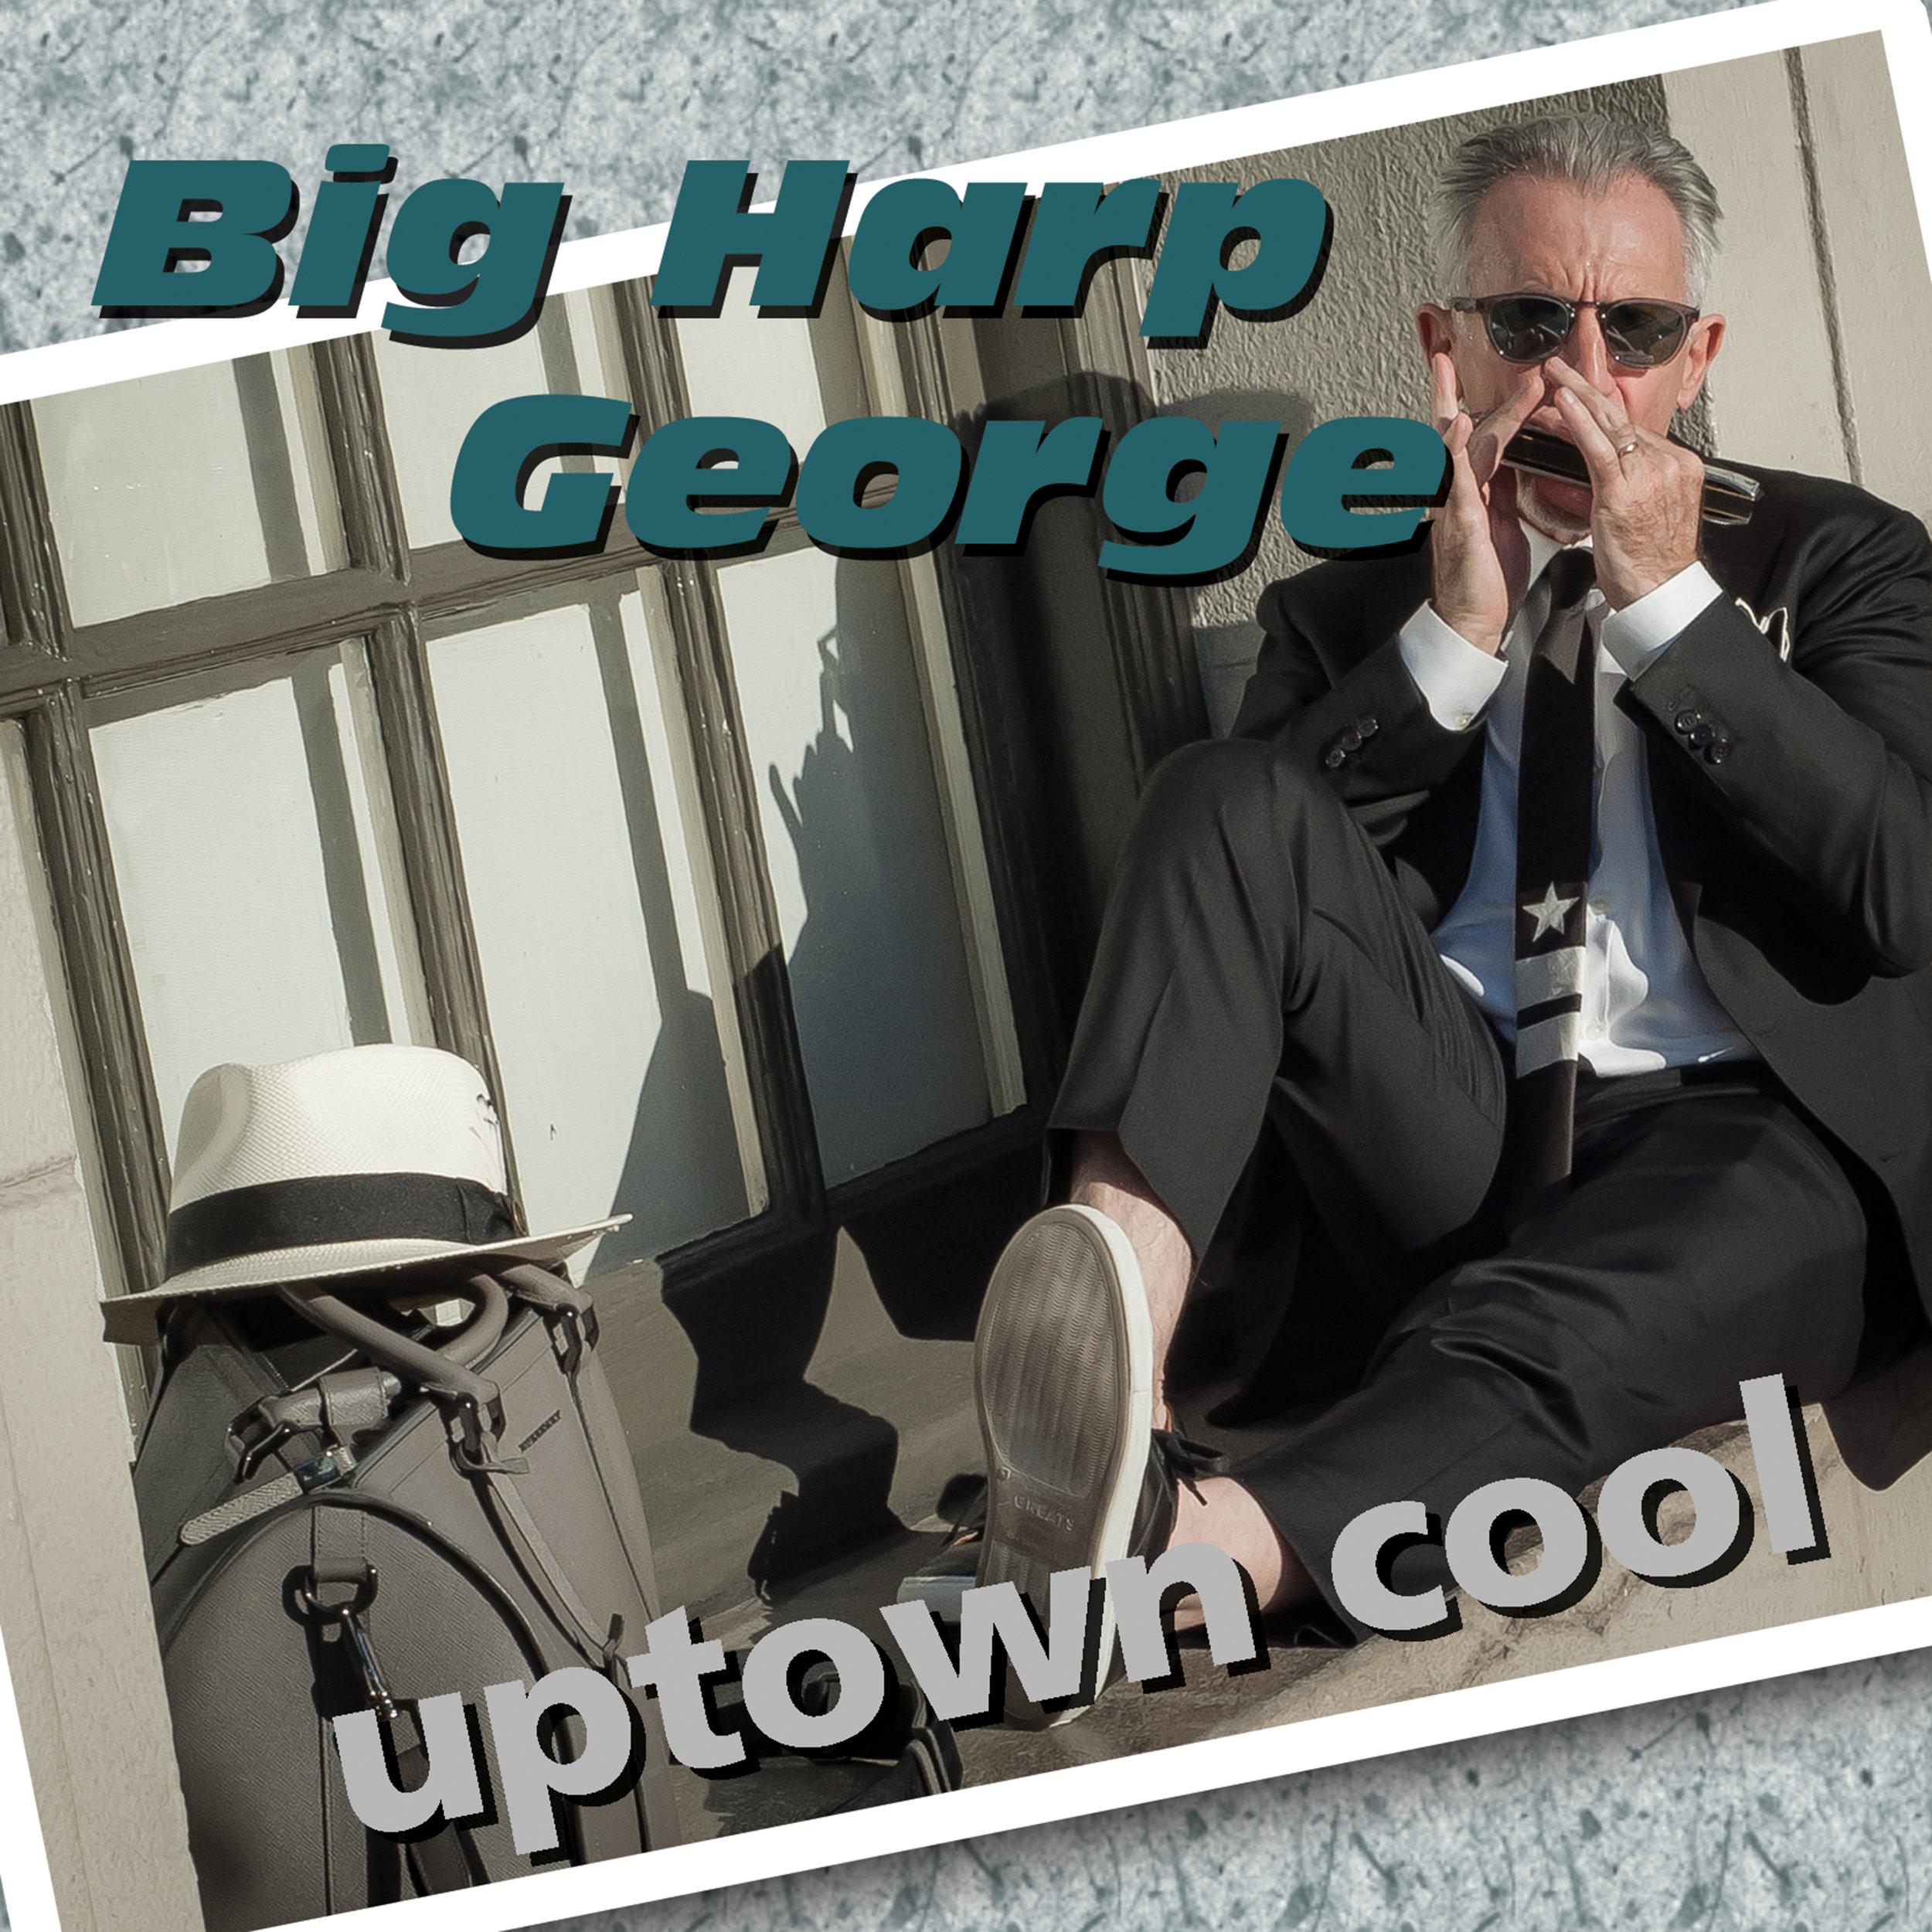 Big Harp George Uptown Cool